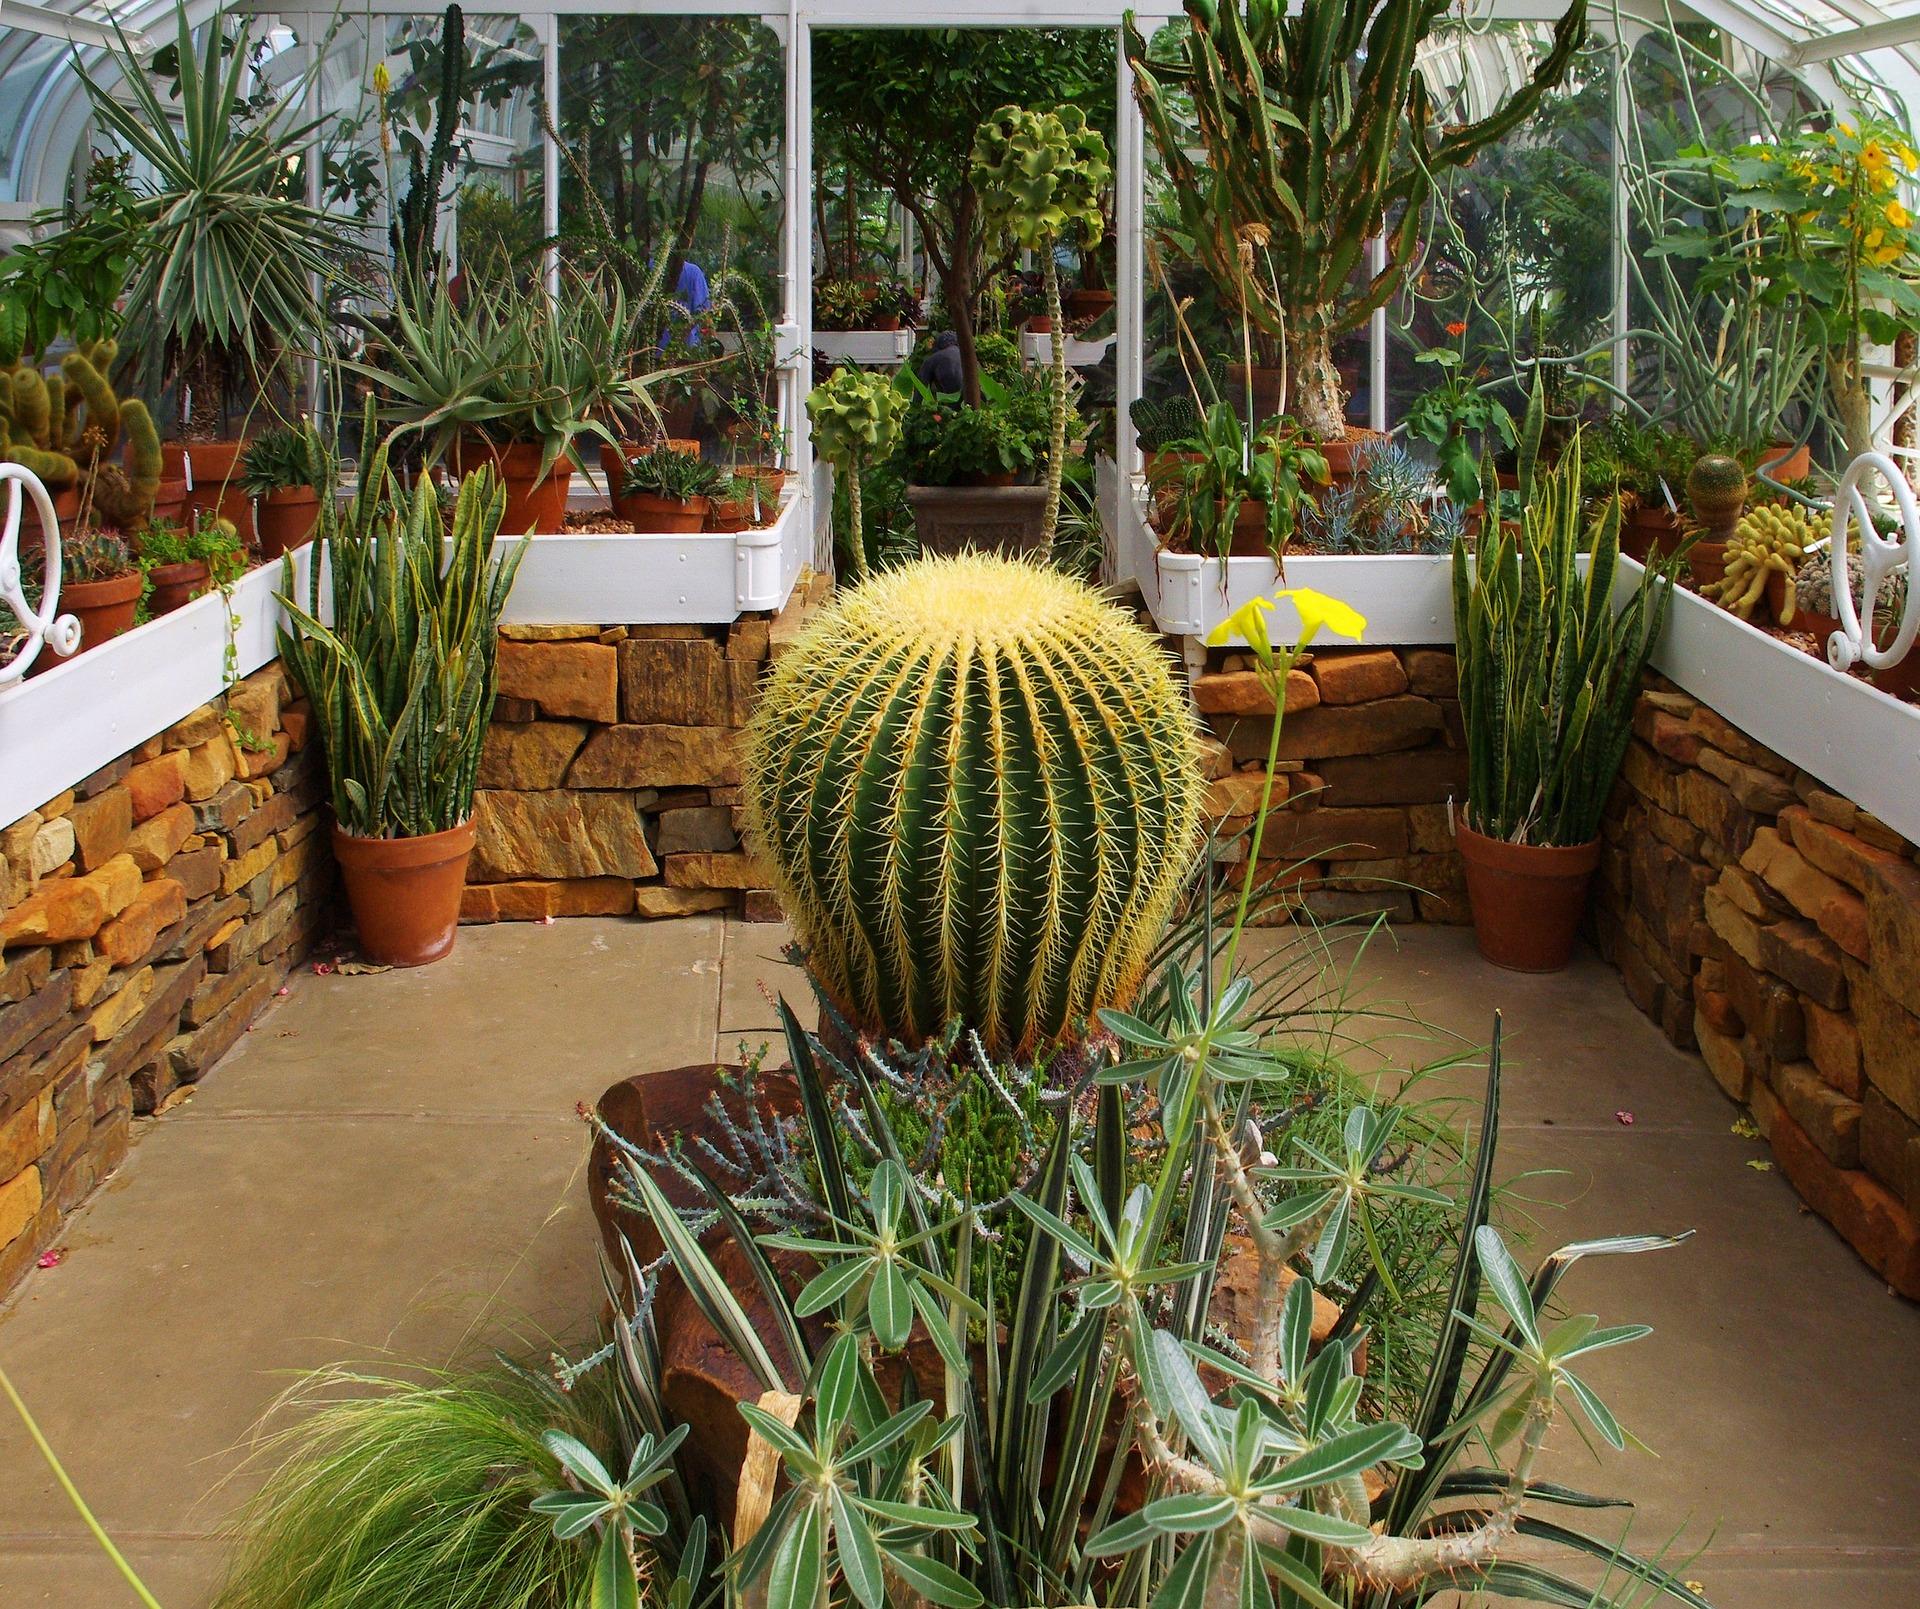 A bulbous cactus in a courtyard.